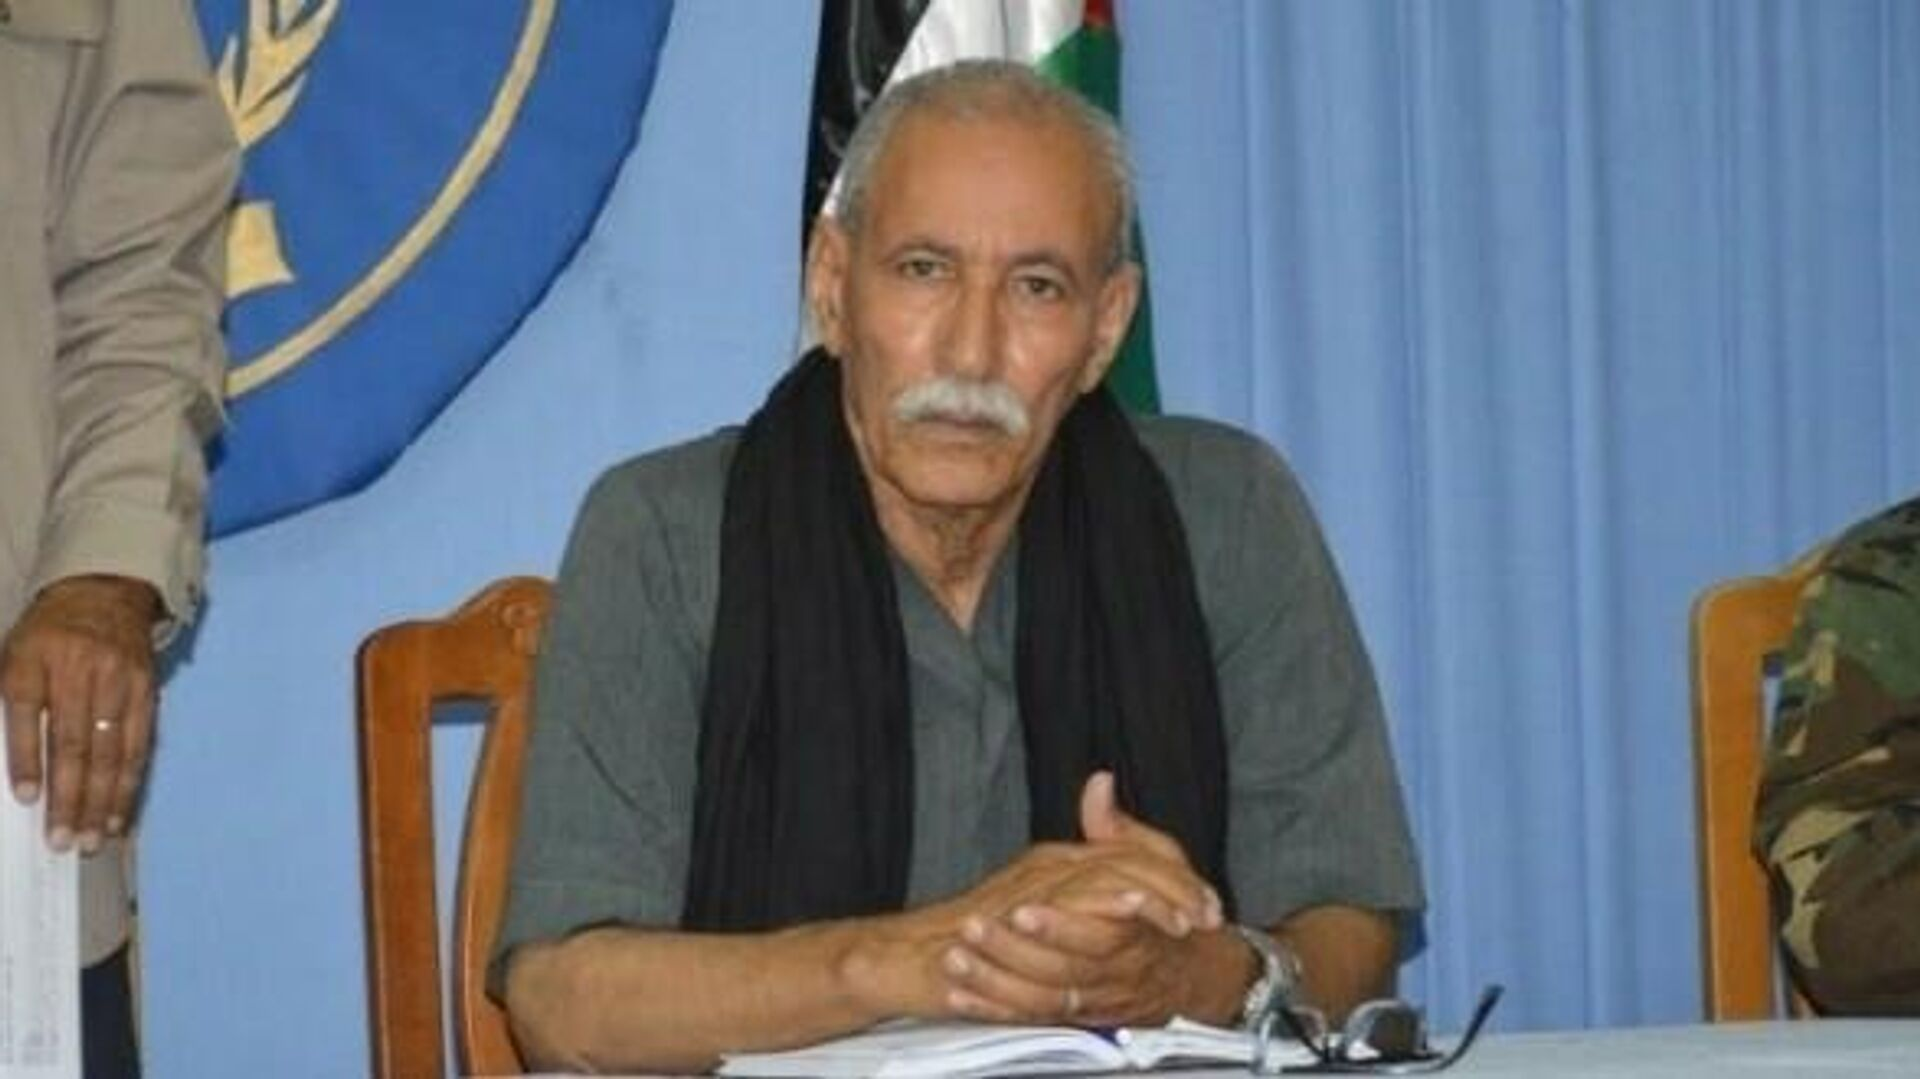 El líder del Frente Polisario, Brahim Ghali - Sputnik Mundo, 1920, 29.09.2021